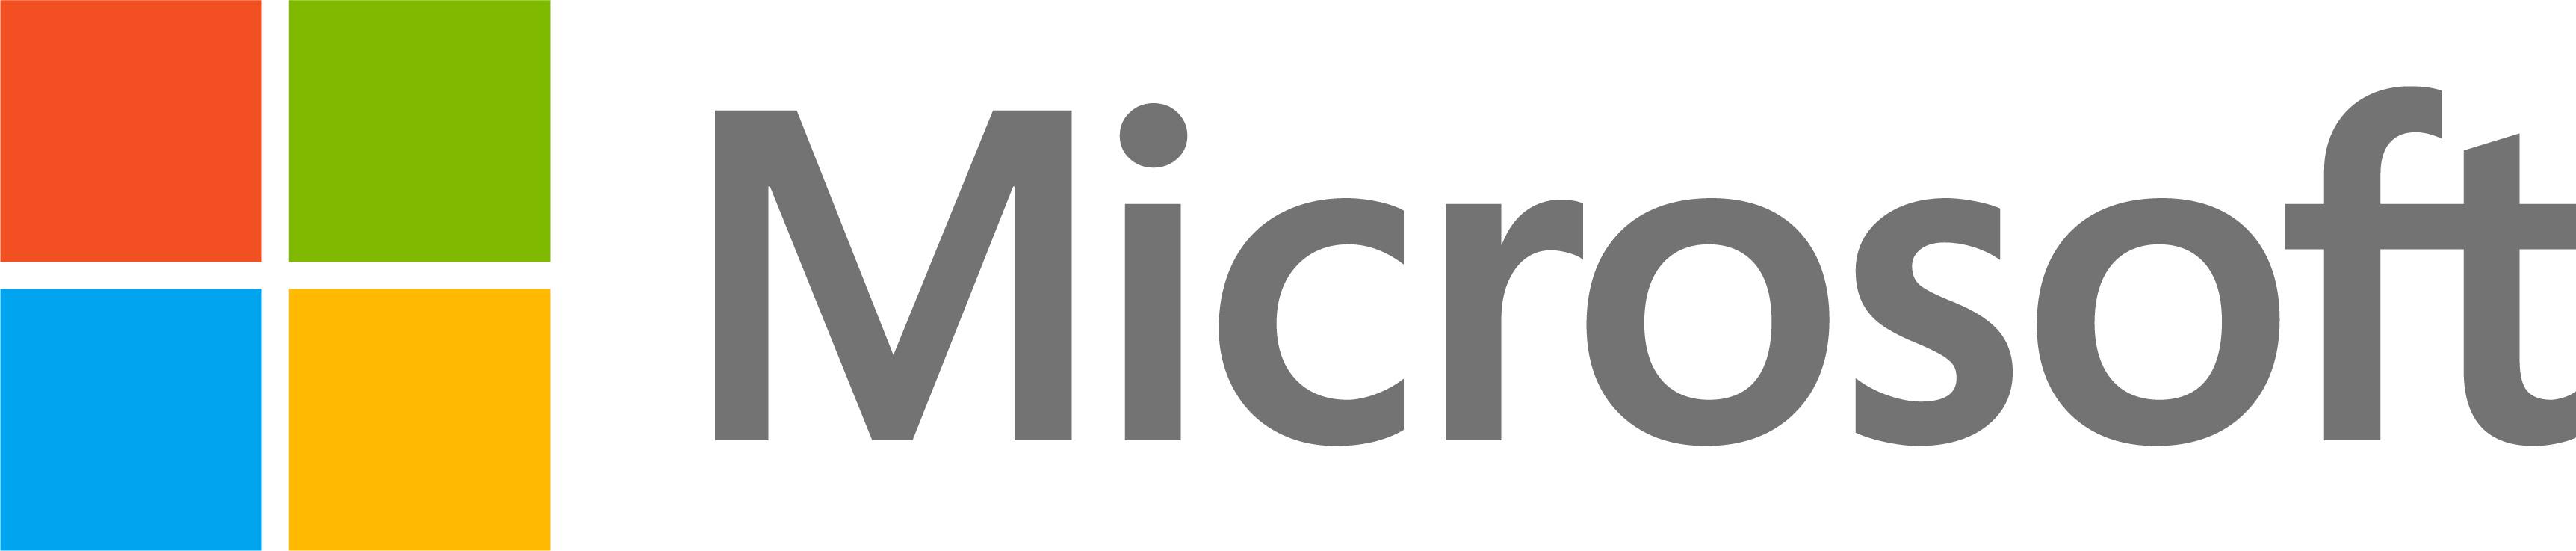 Microsoft_2012_Logo